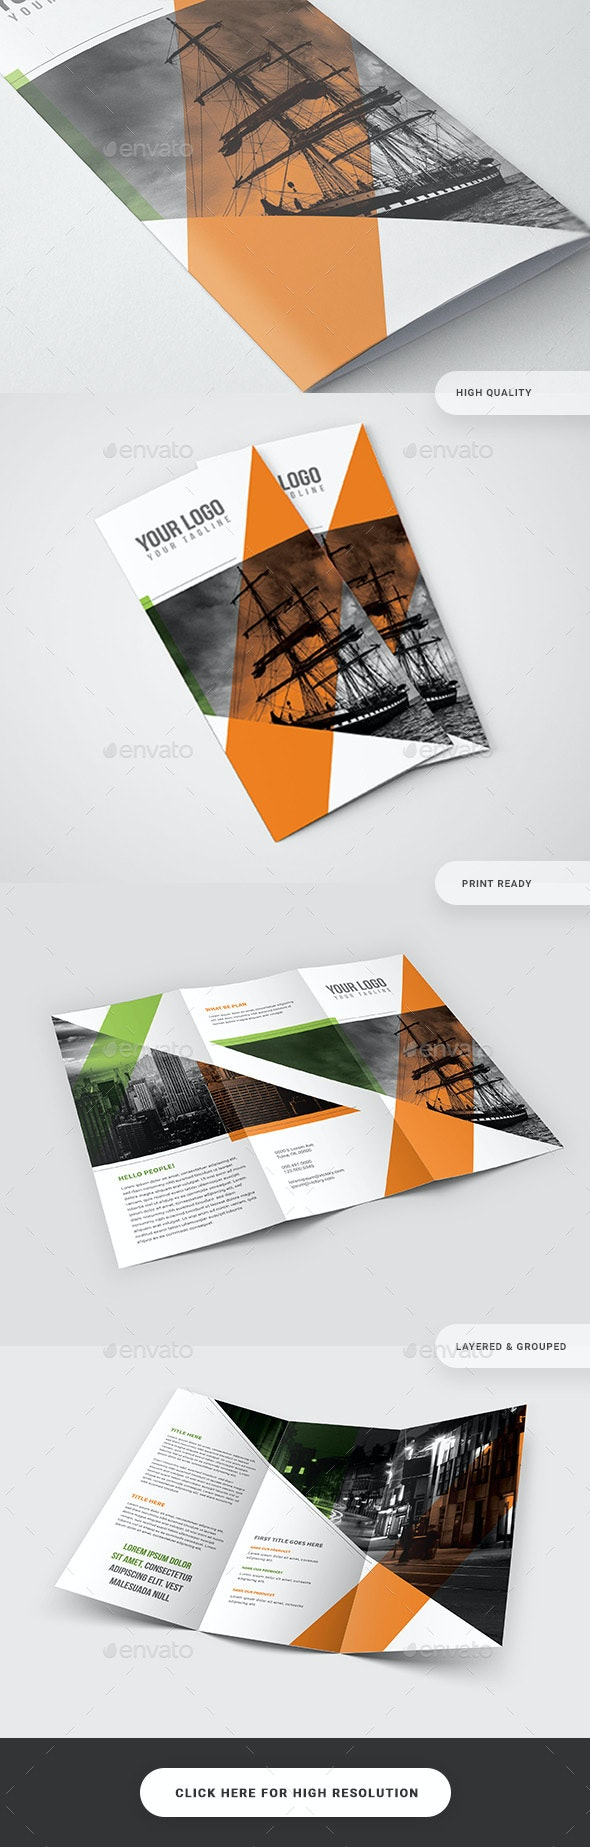 Multipurpose Trifold Brochure - Catalogs Brochures